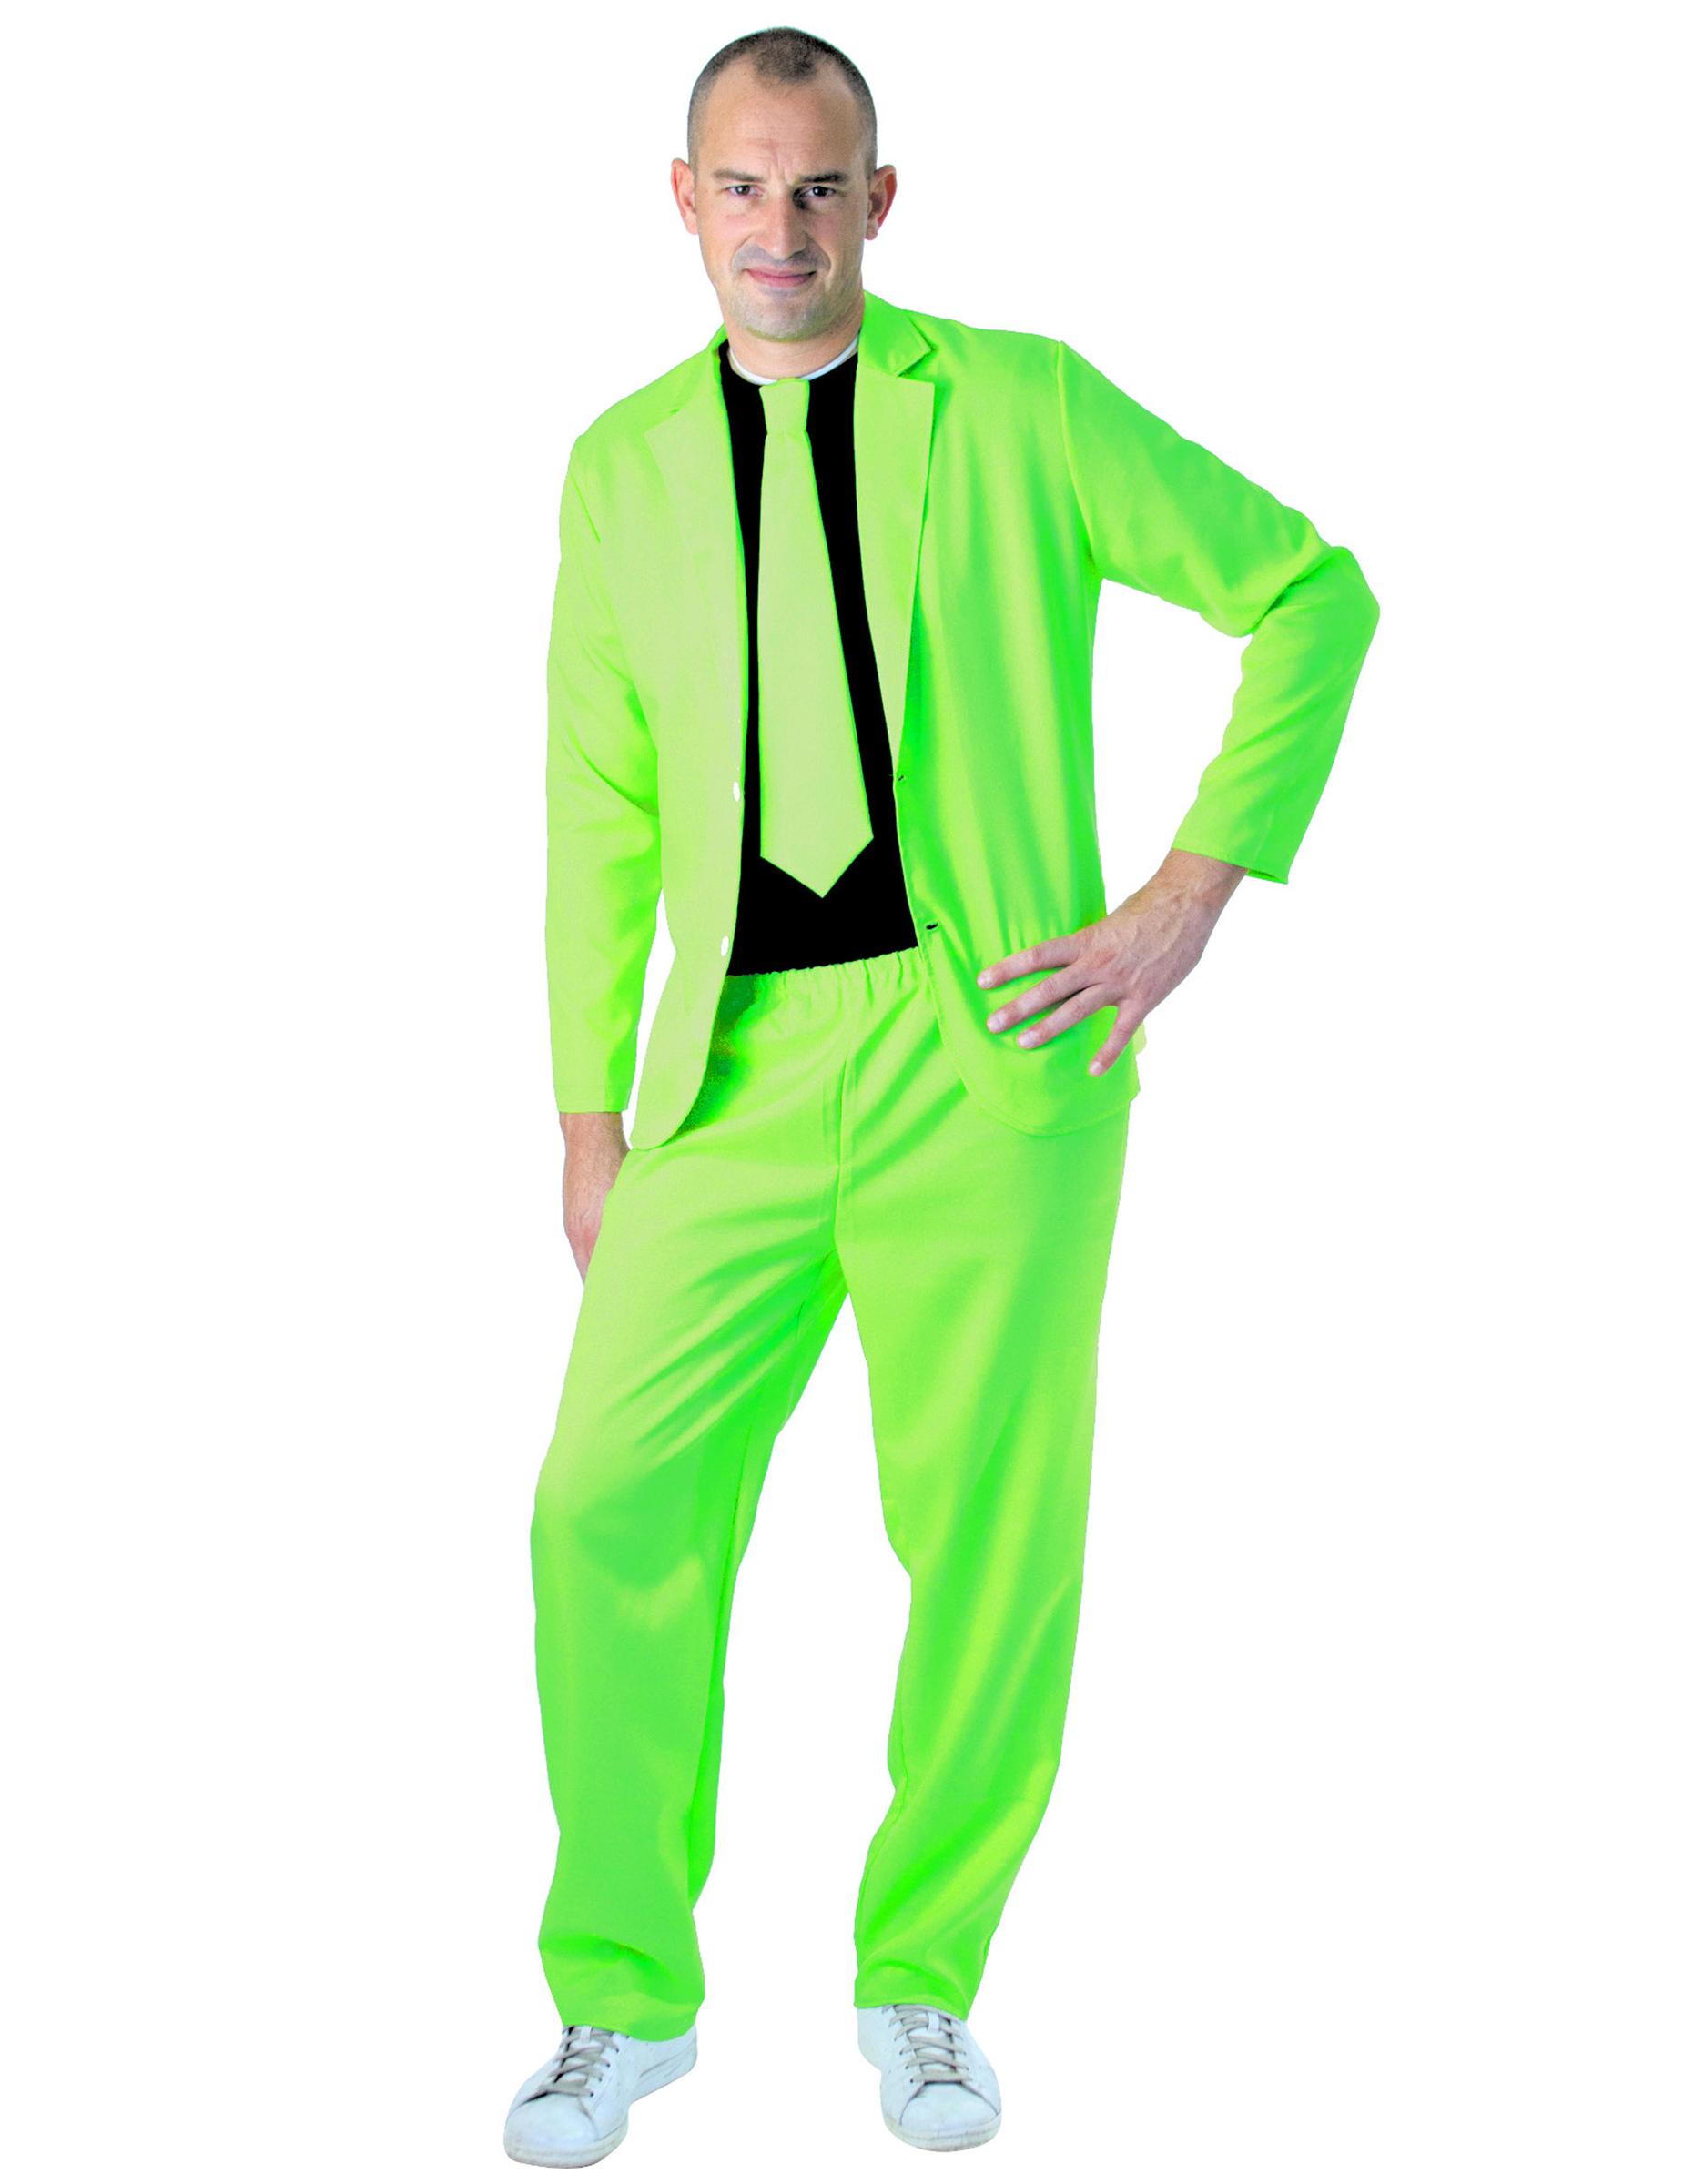 costume fashion vert fluo adulte deguise toi achat de. Black Bedroom Furniture Sets. Home Design Ideas